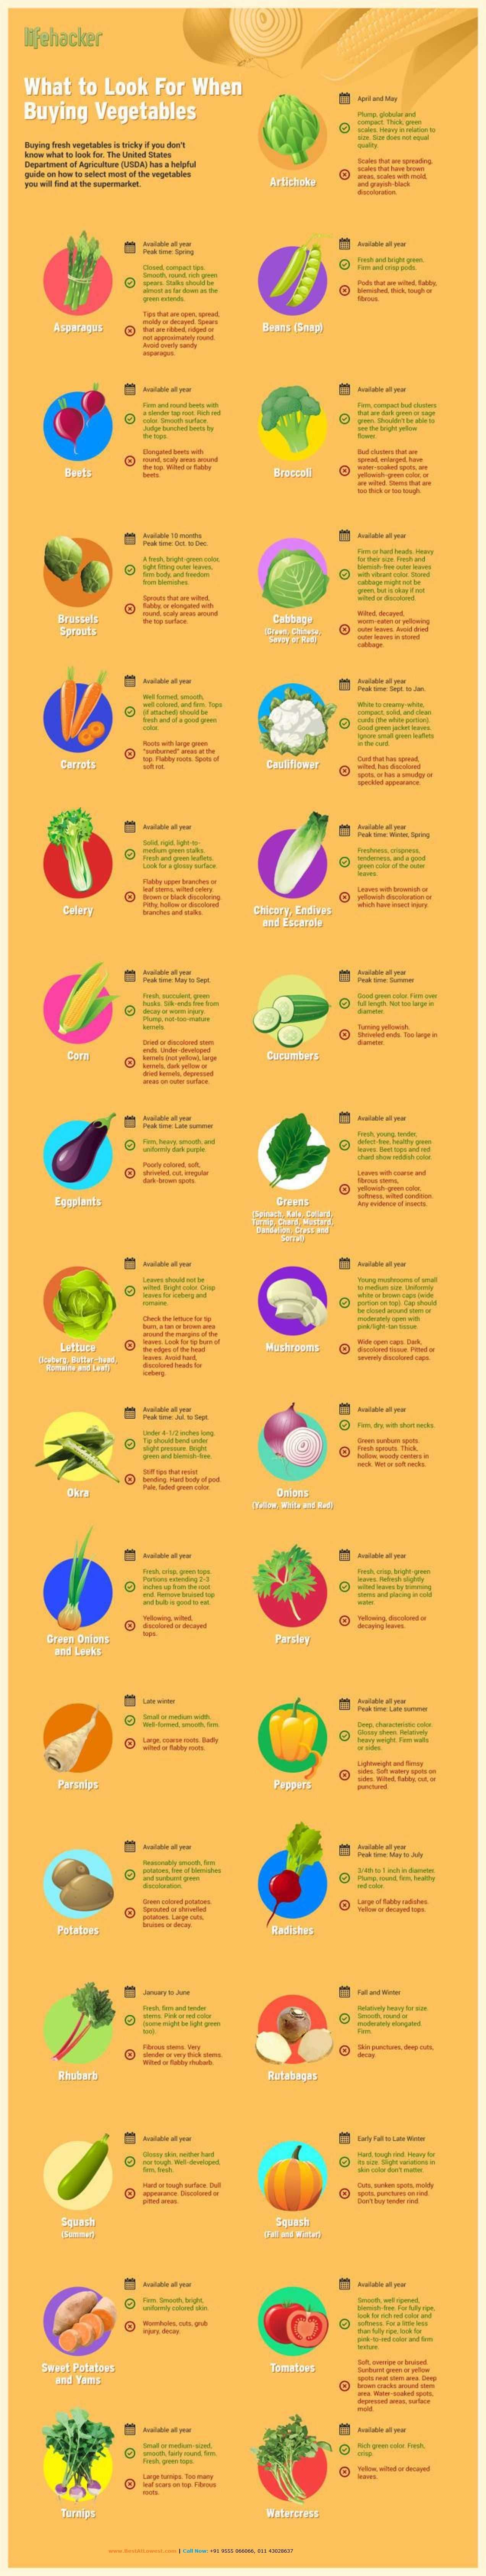 Vital Veggies Infographic